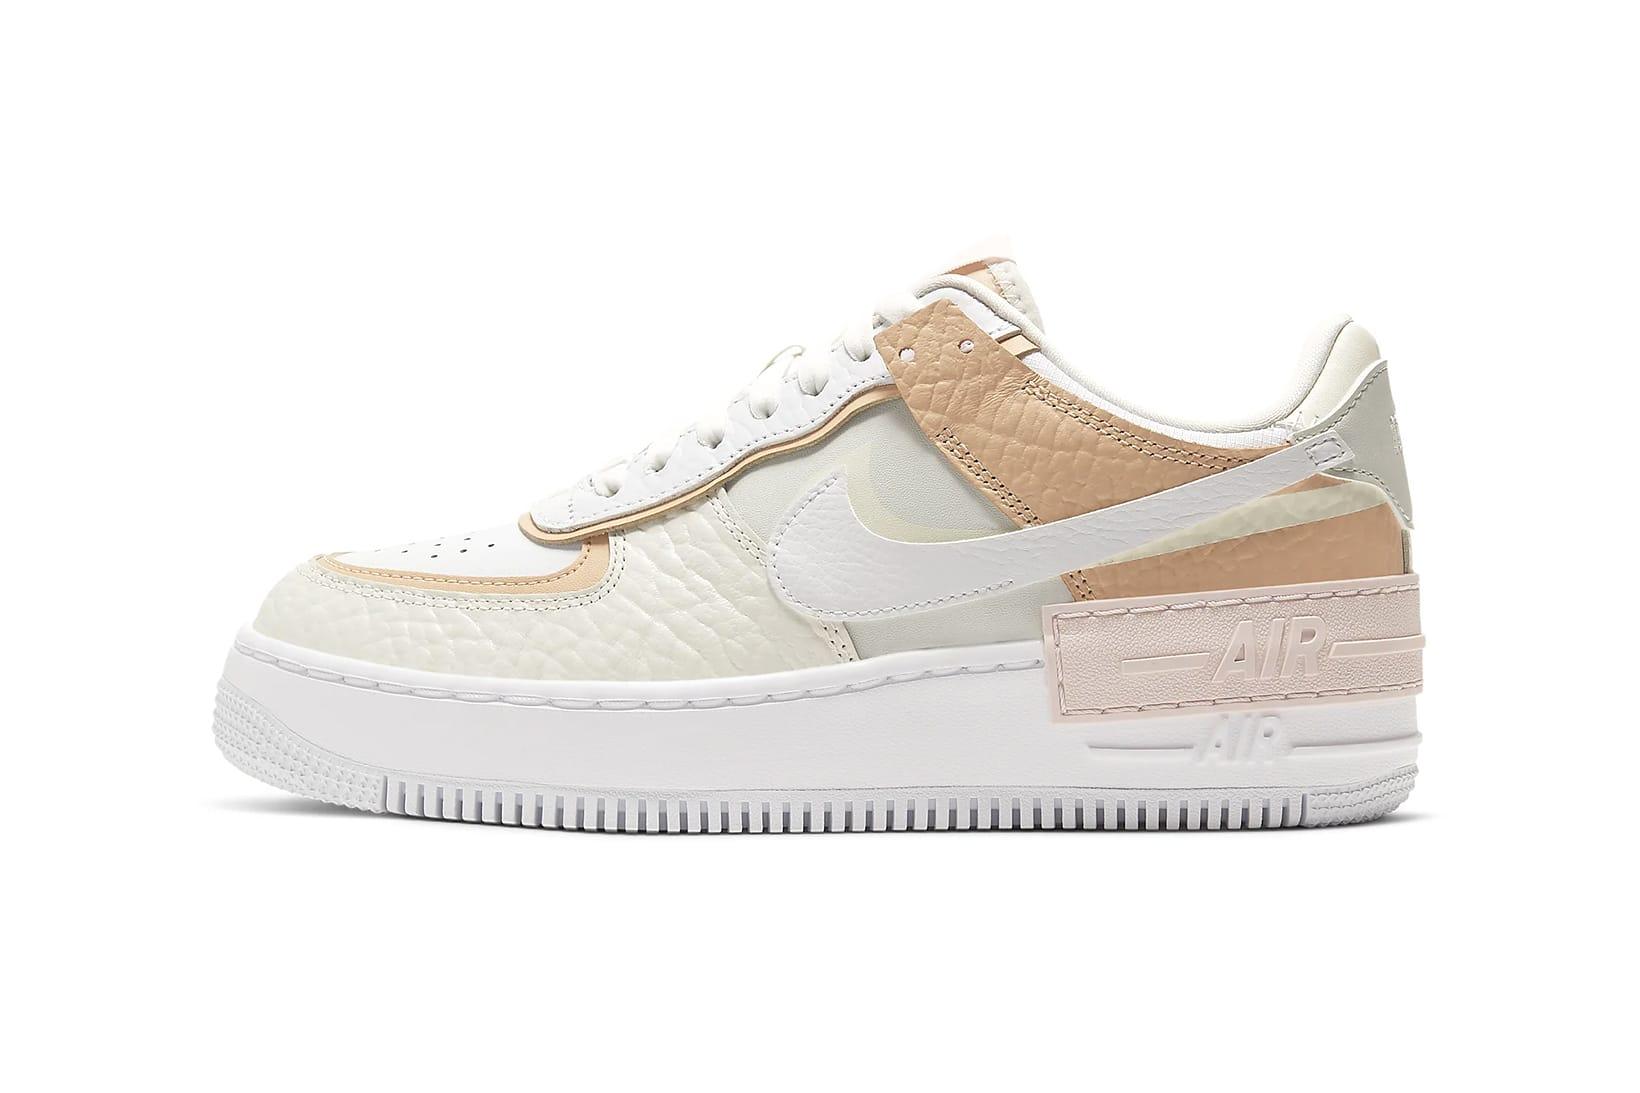 Nike Air Force 1 07 in \